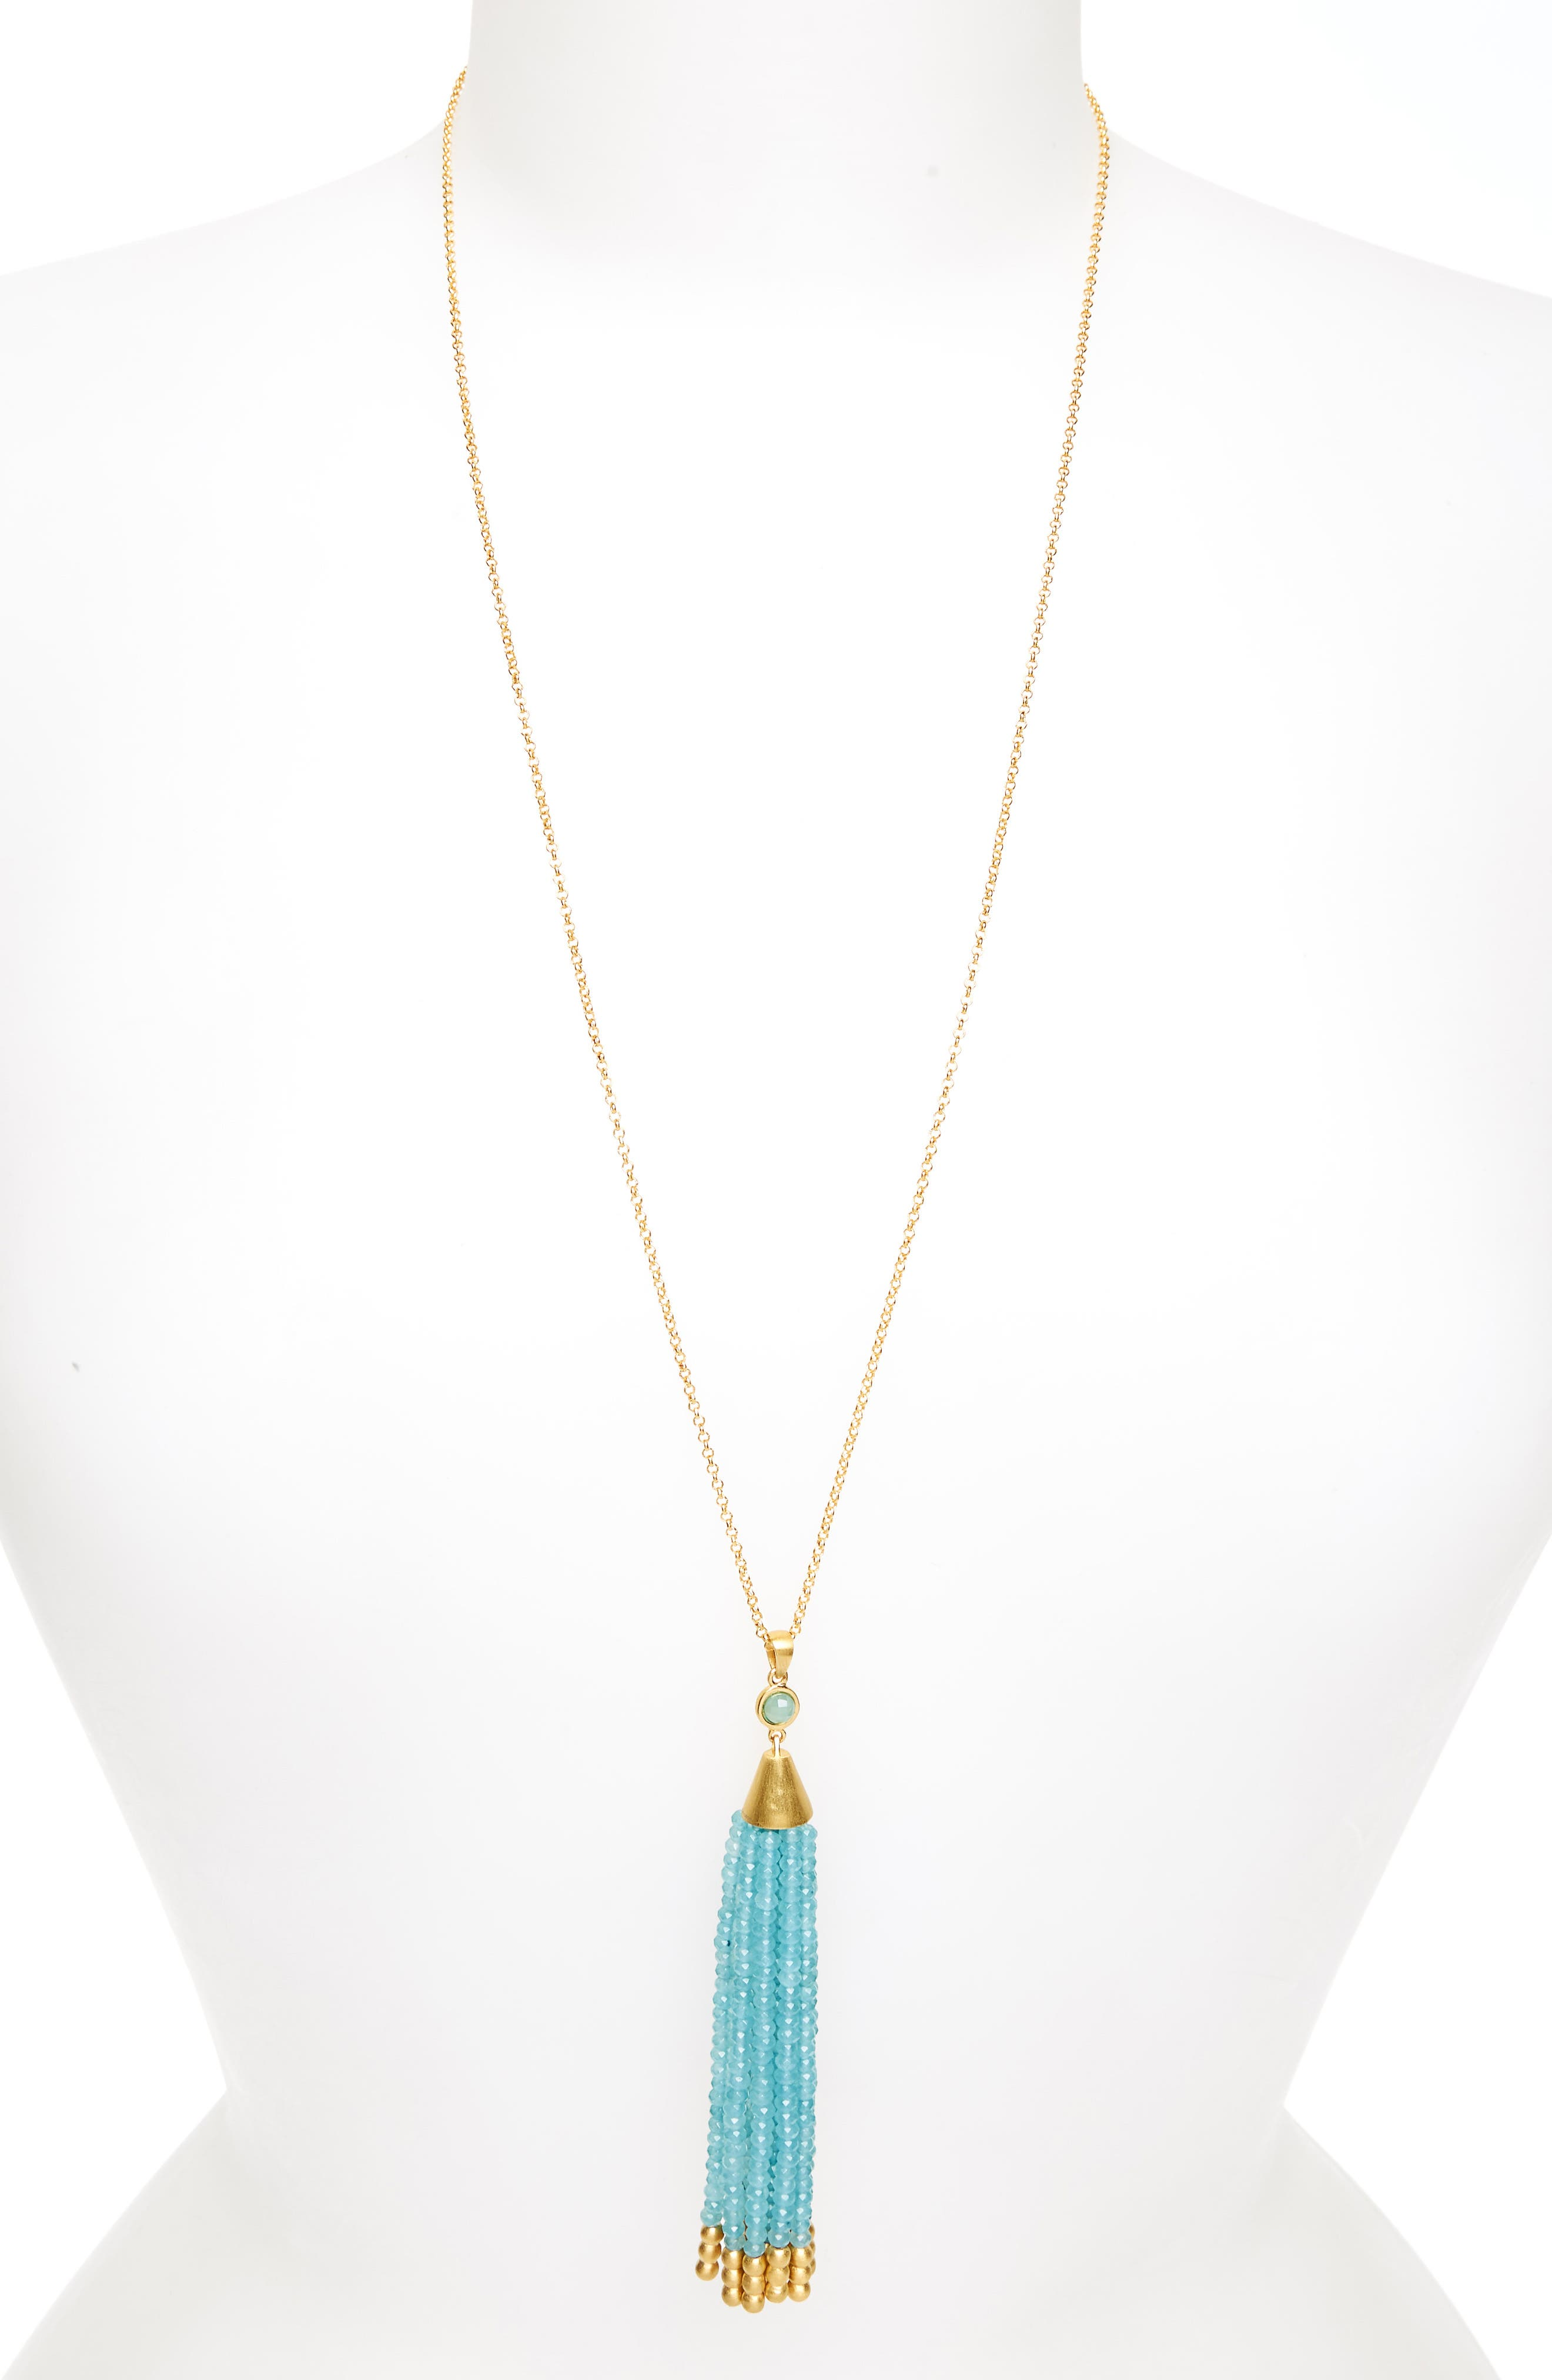 Samba Tassel Pendant Necklace,                         Main,                         color, Ocean Blue Chalcedony/ Gold